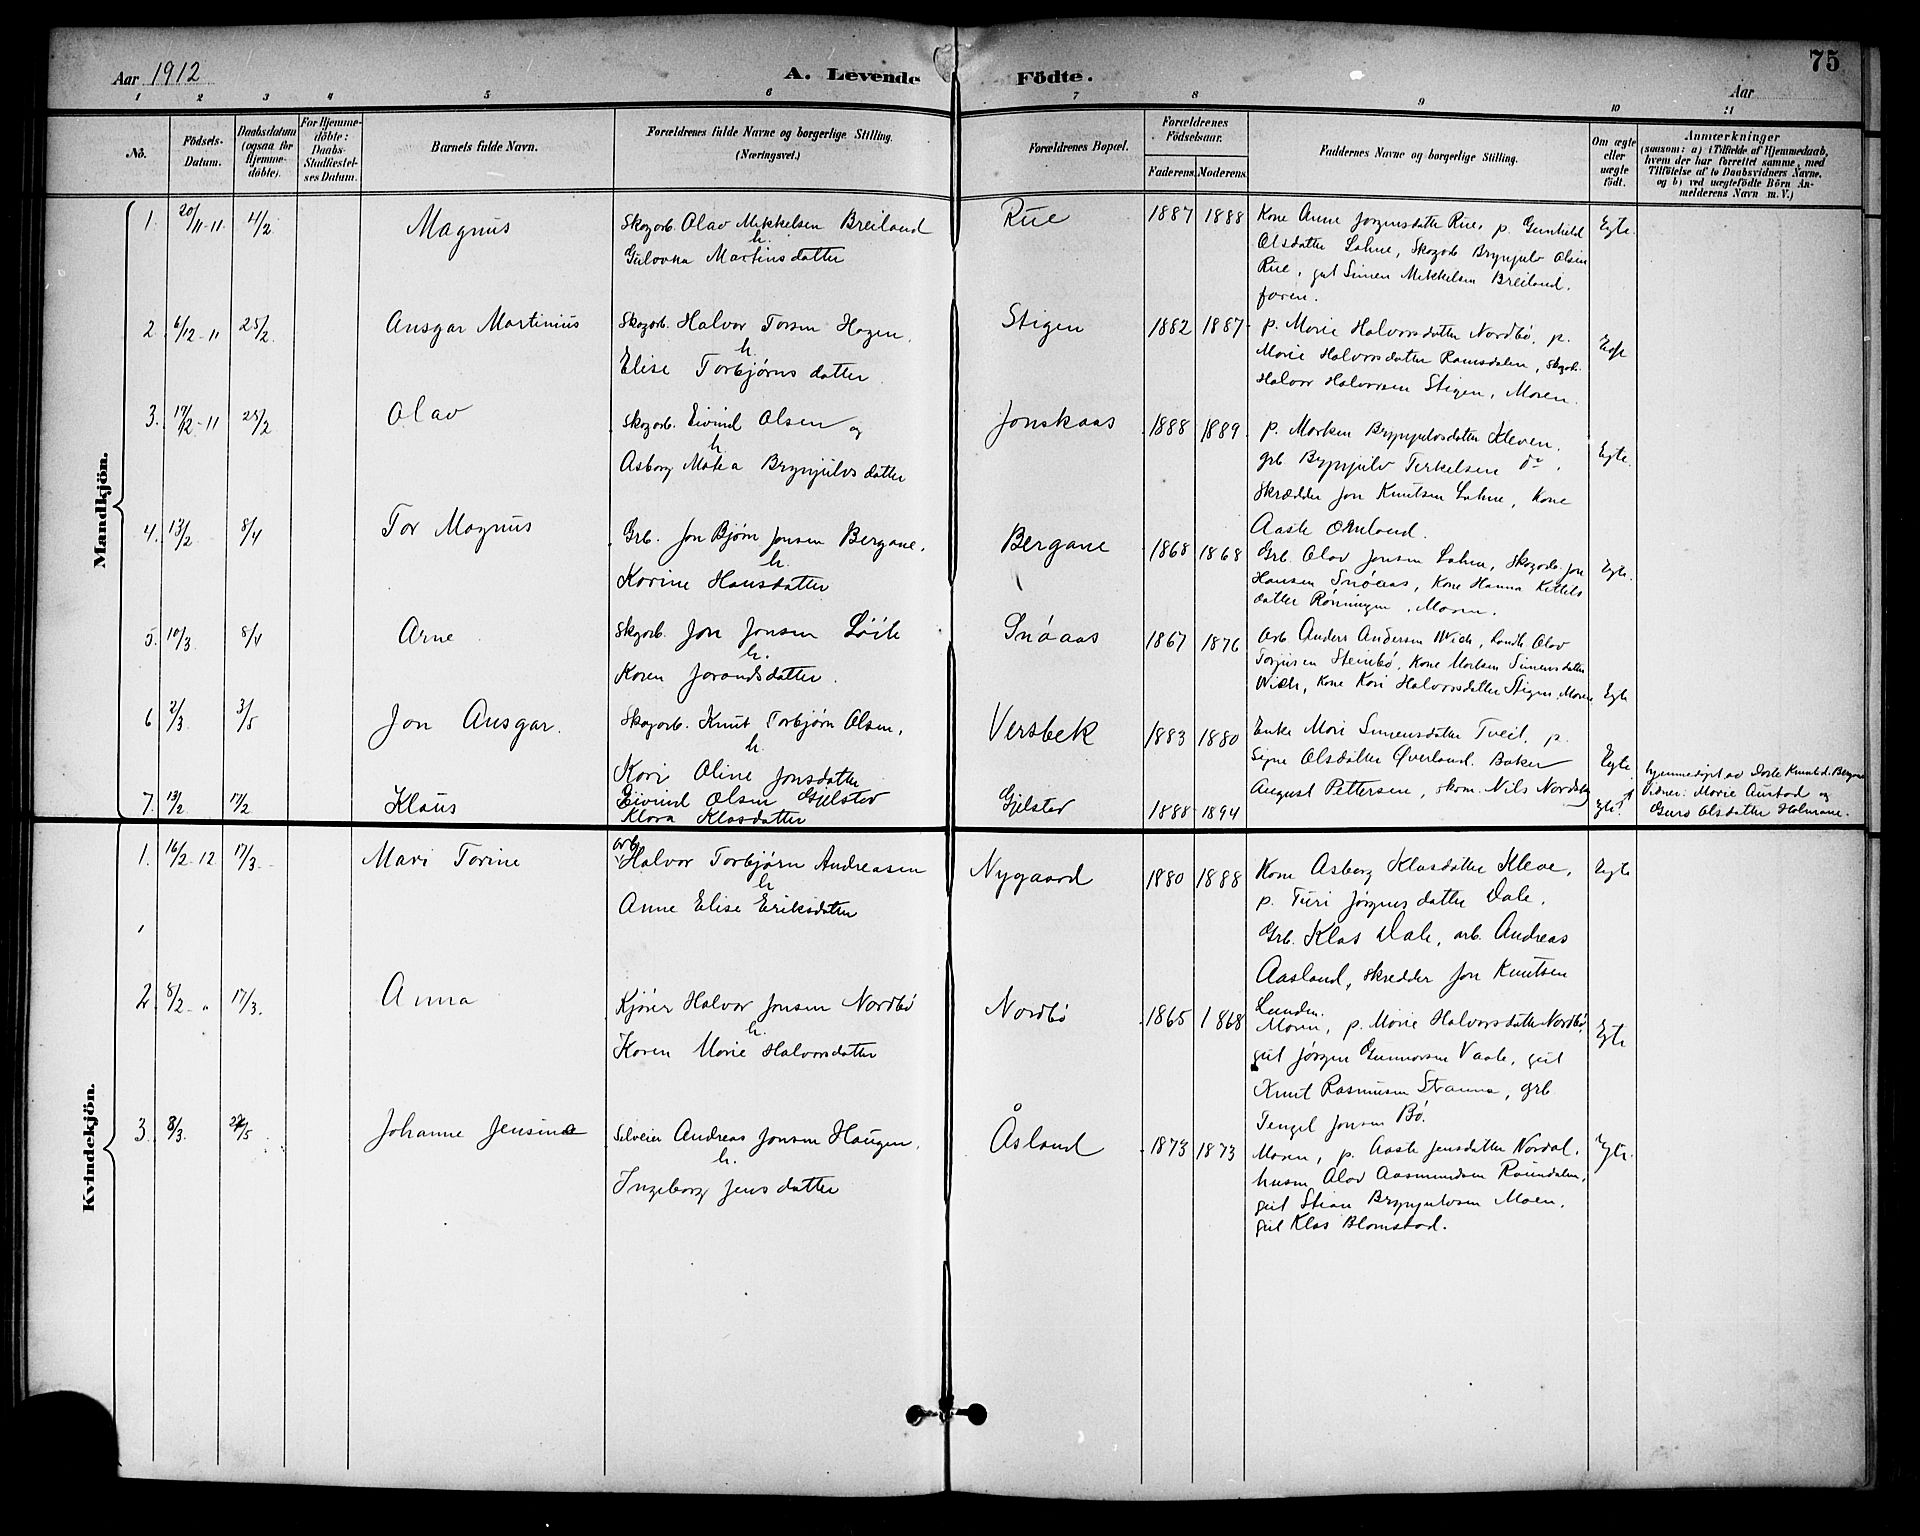 SAKO, Drangedal kirkebøker, G/Gb/L0002: Klokkerbok nr. II 2, 1895-1918, s. 75